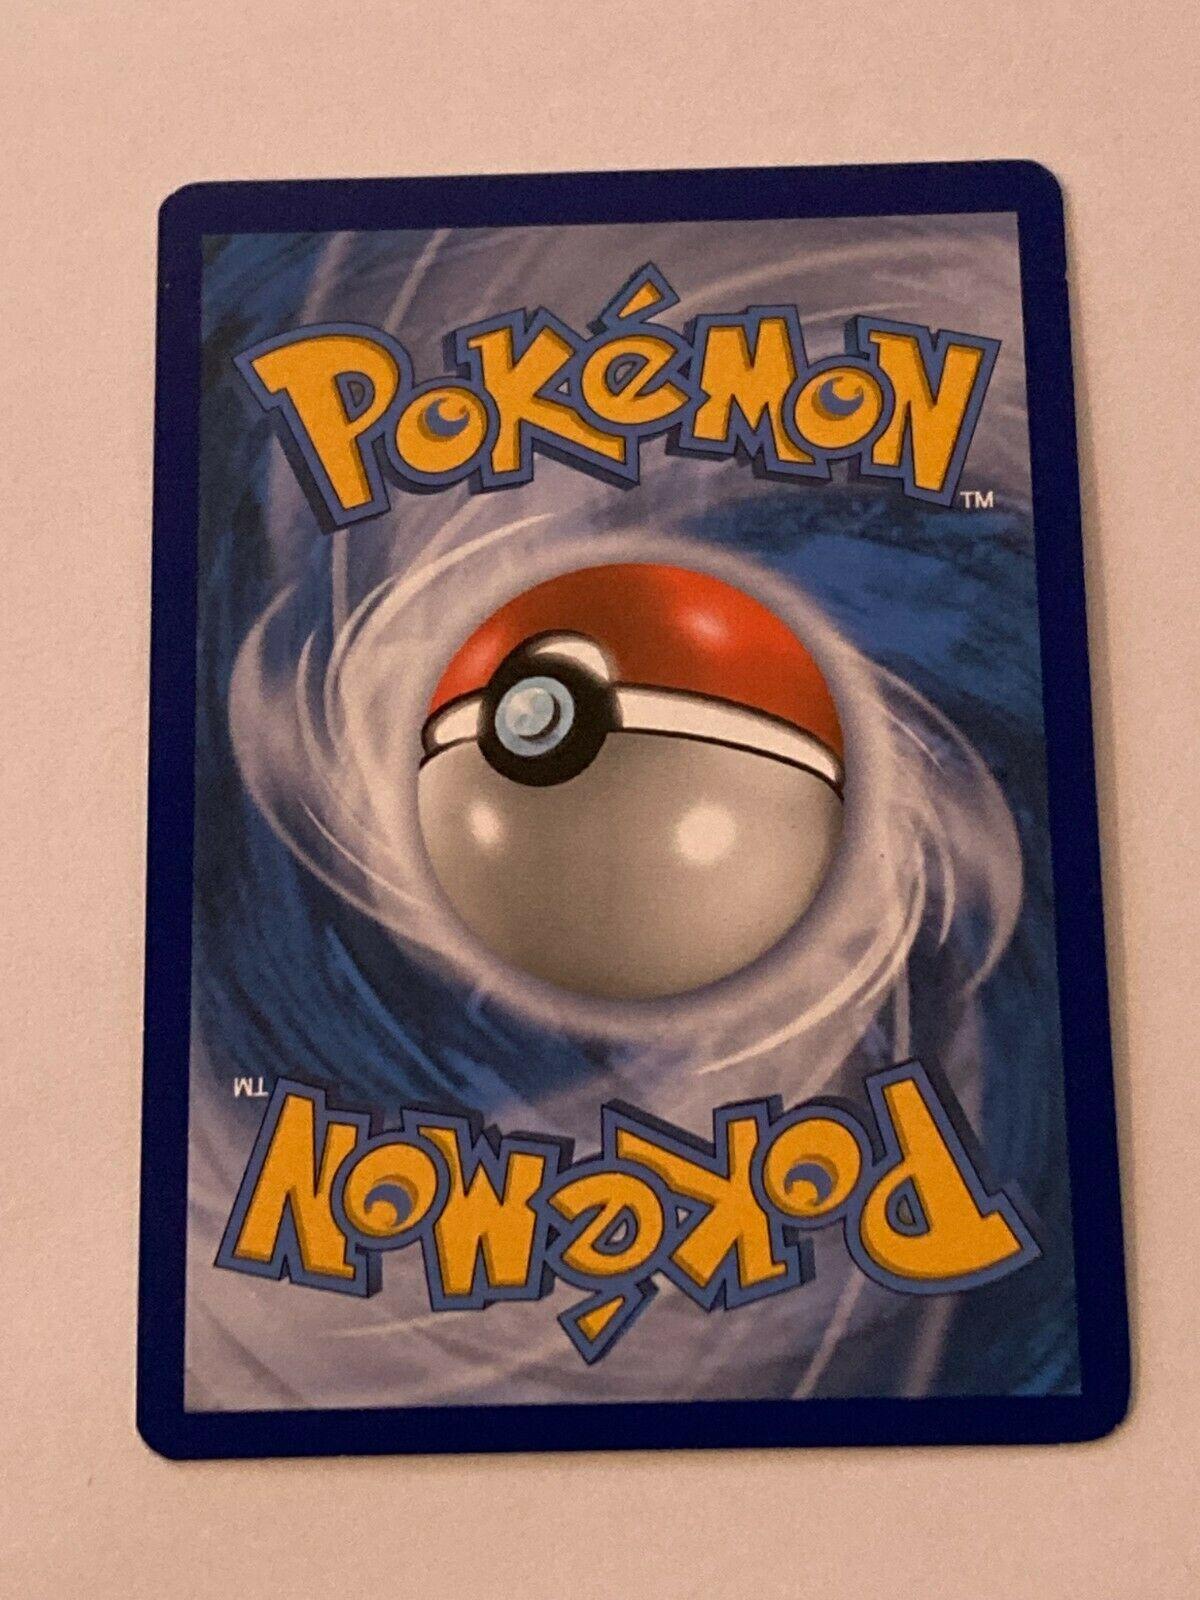 Charizard GX 2019 Pokemon Sun & Moon Black Star Promos Foil Card #SM195 - Image 2